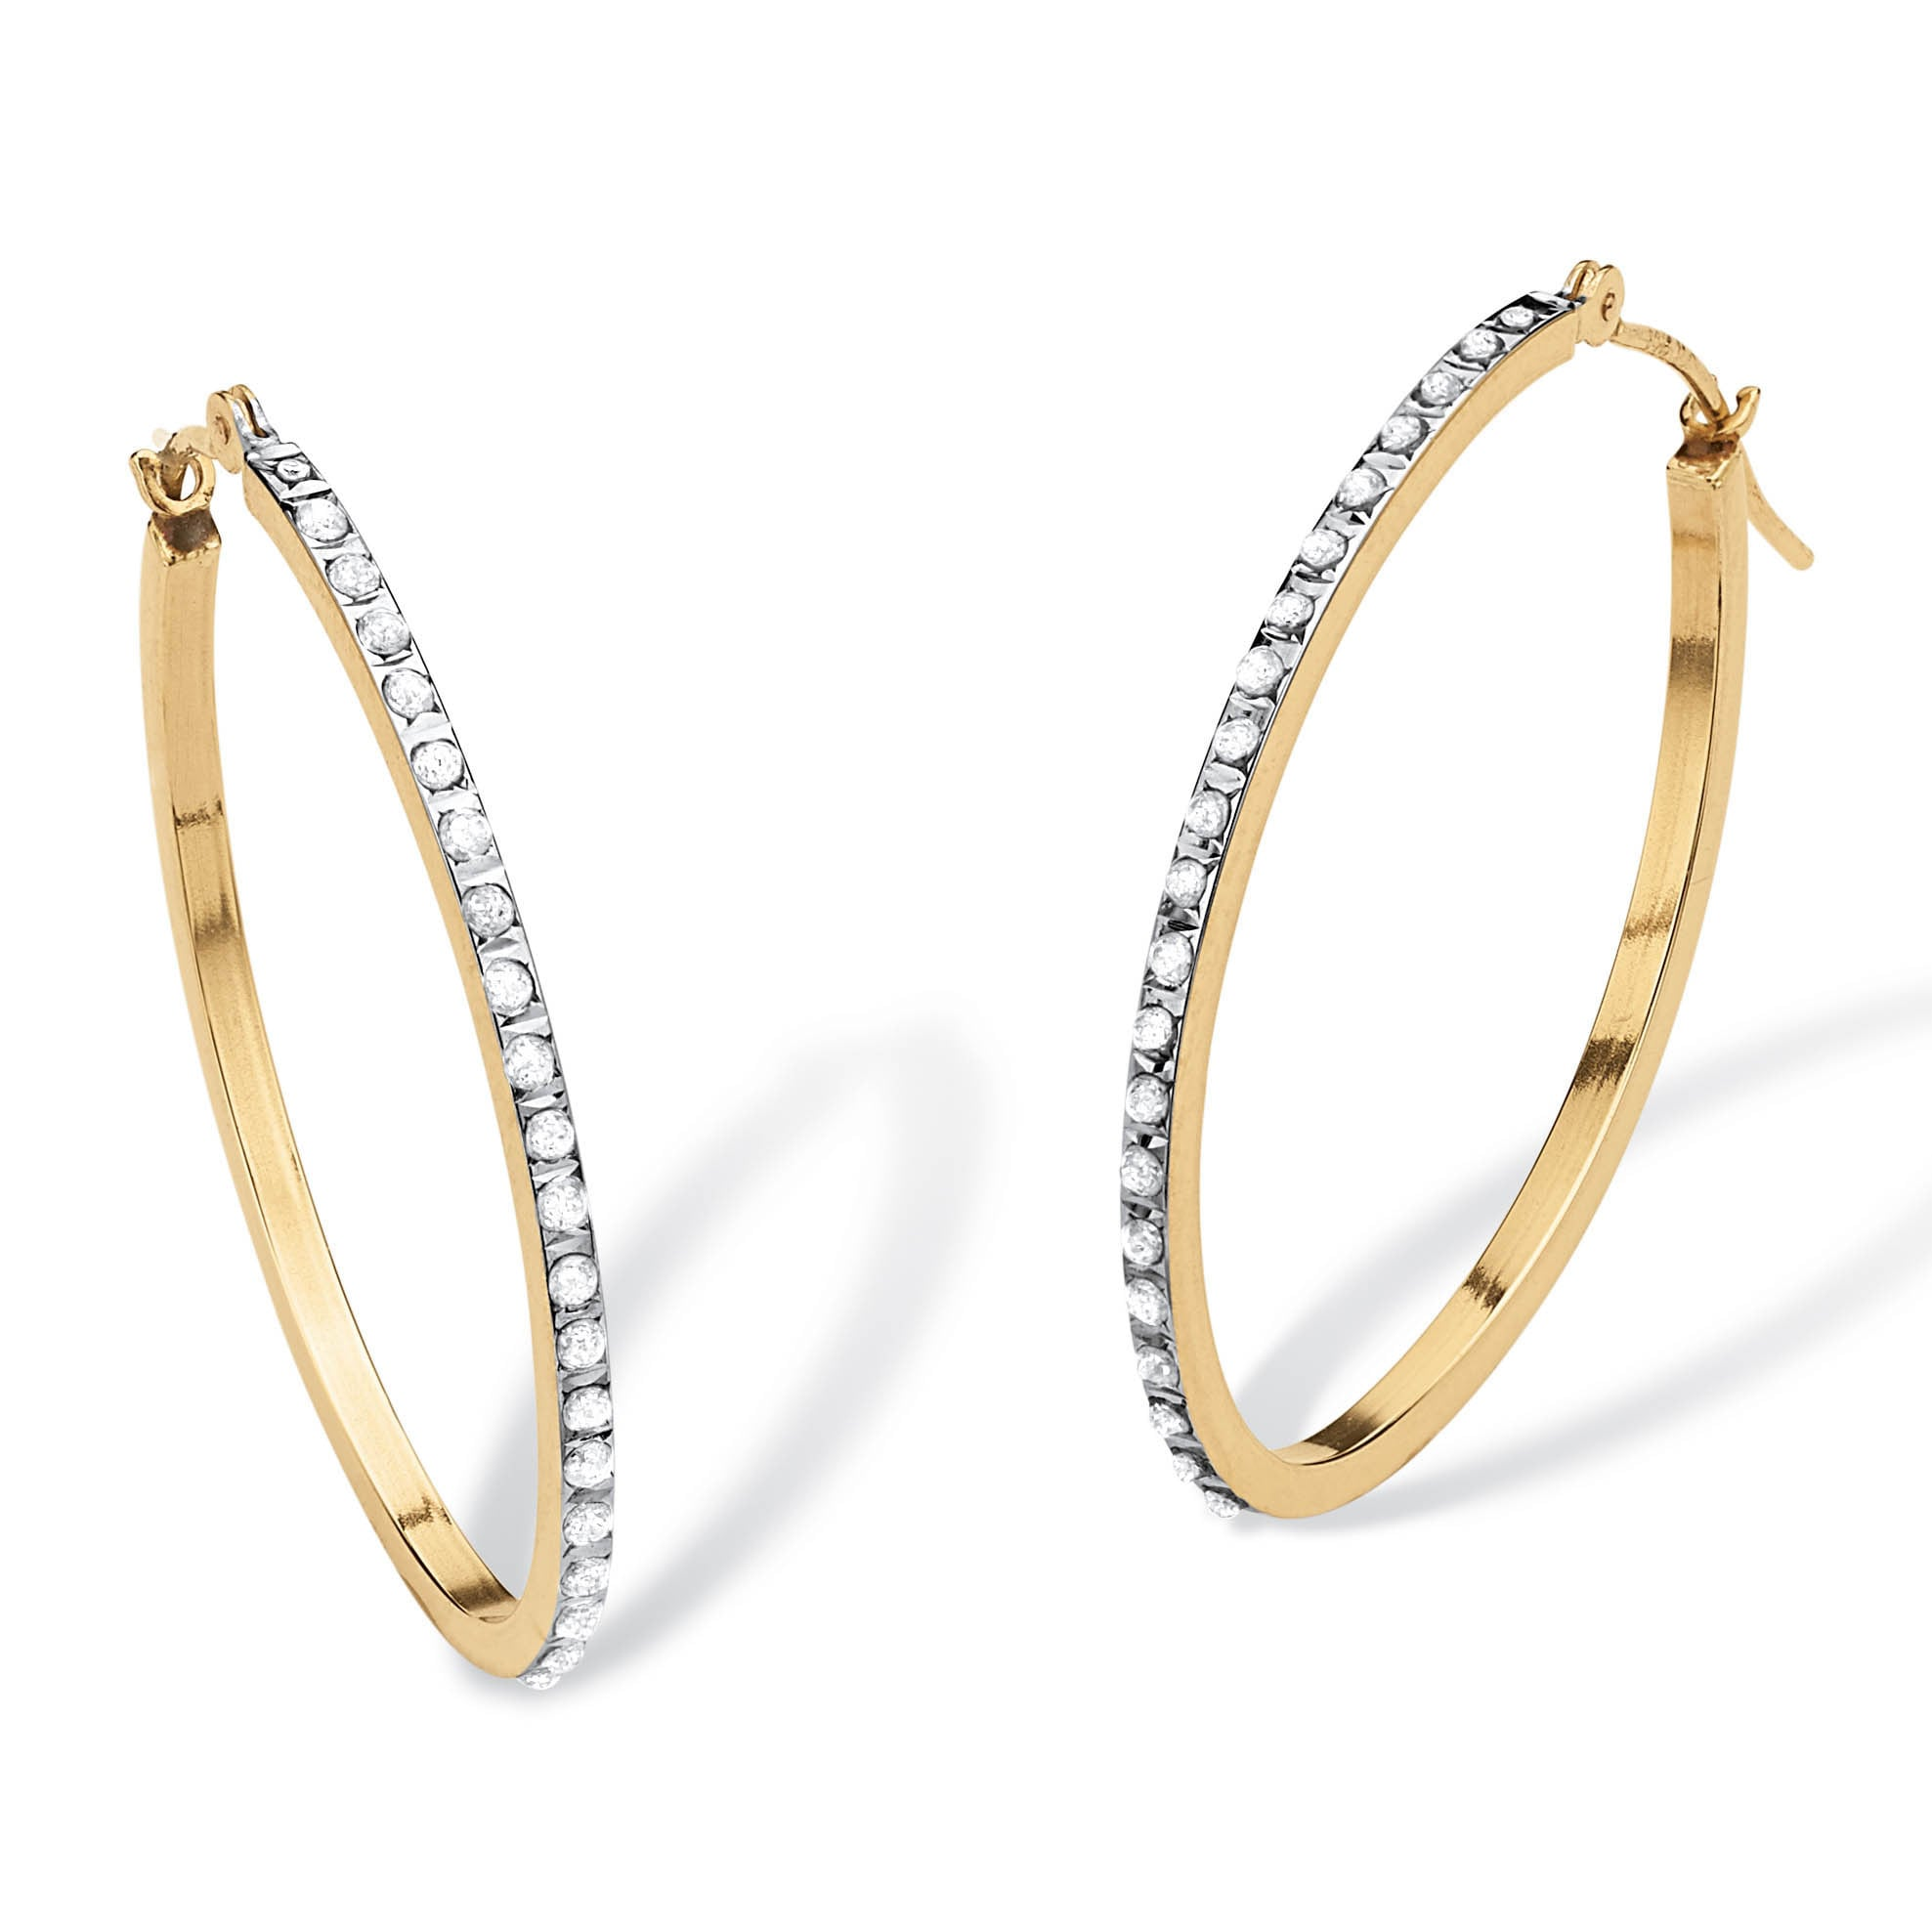 Diamond Accent 14k Yellow Gold Diamond Fascination Hoop Earrings 1 Diameter Overstock 5245701